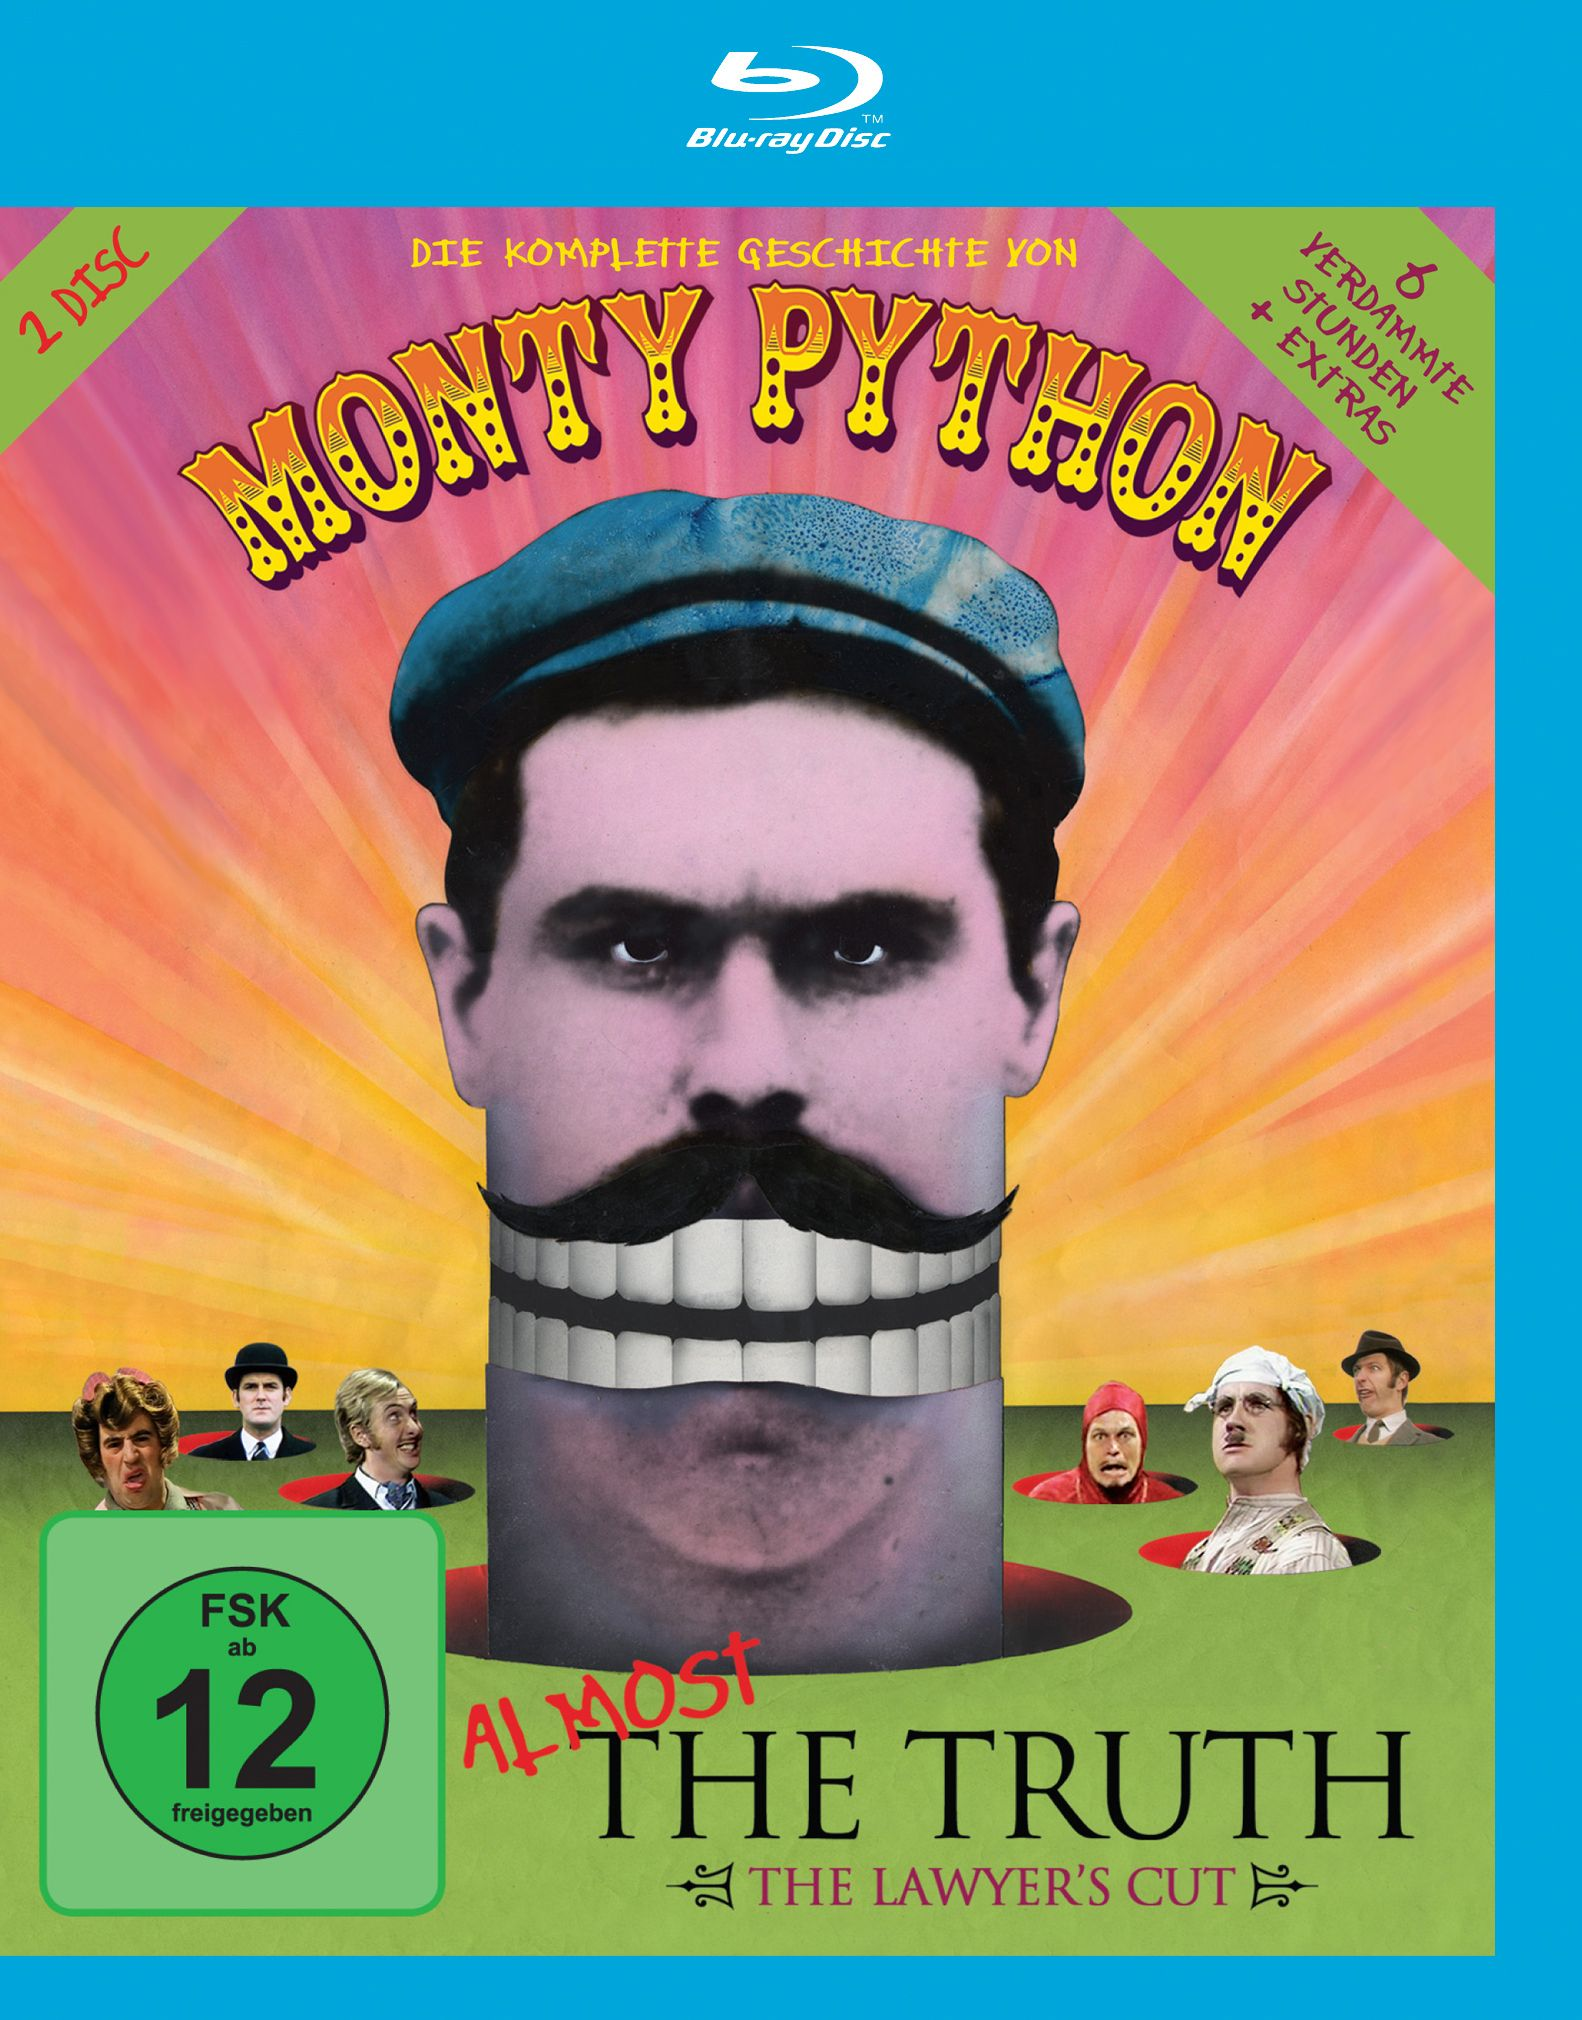 Monty Python - Almost the Truth: Intro Magazine